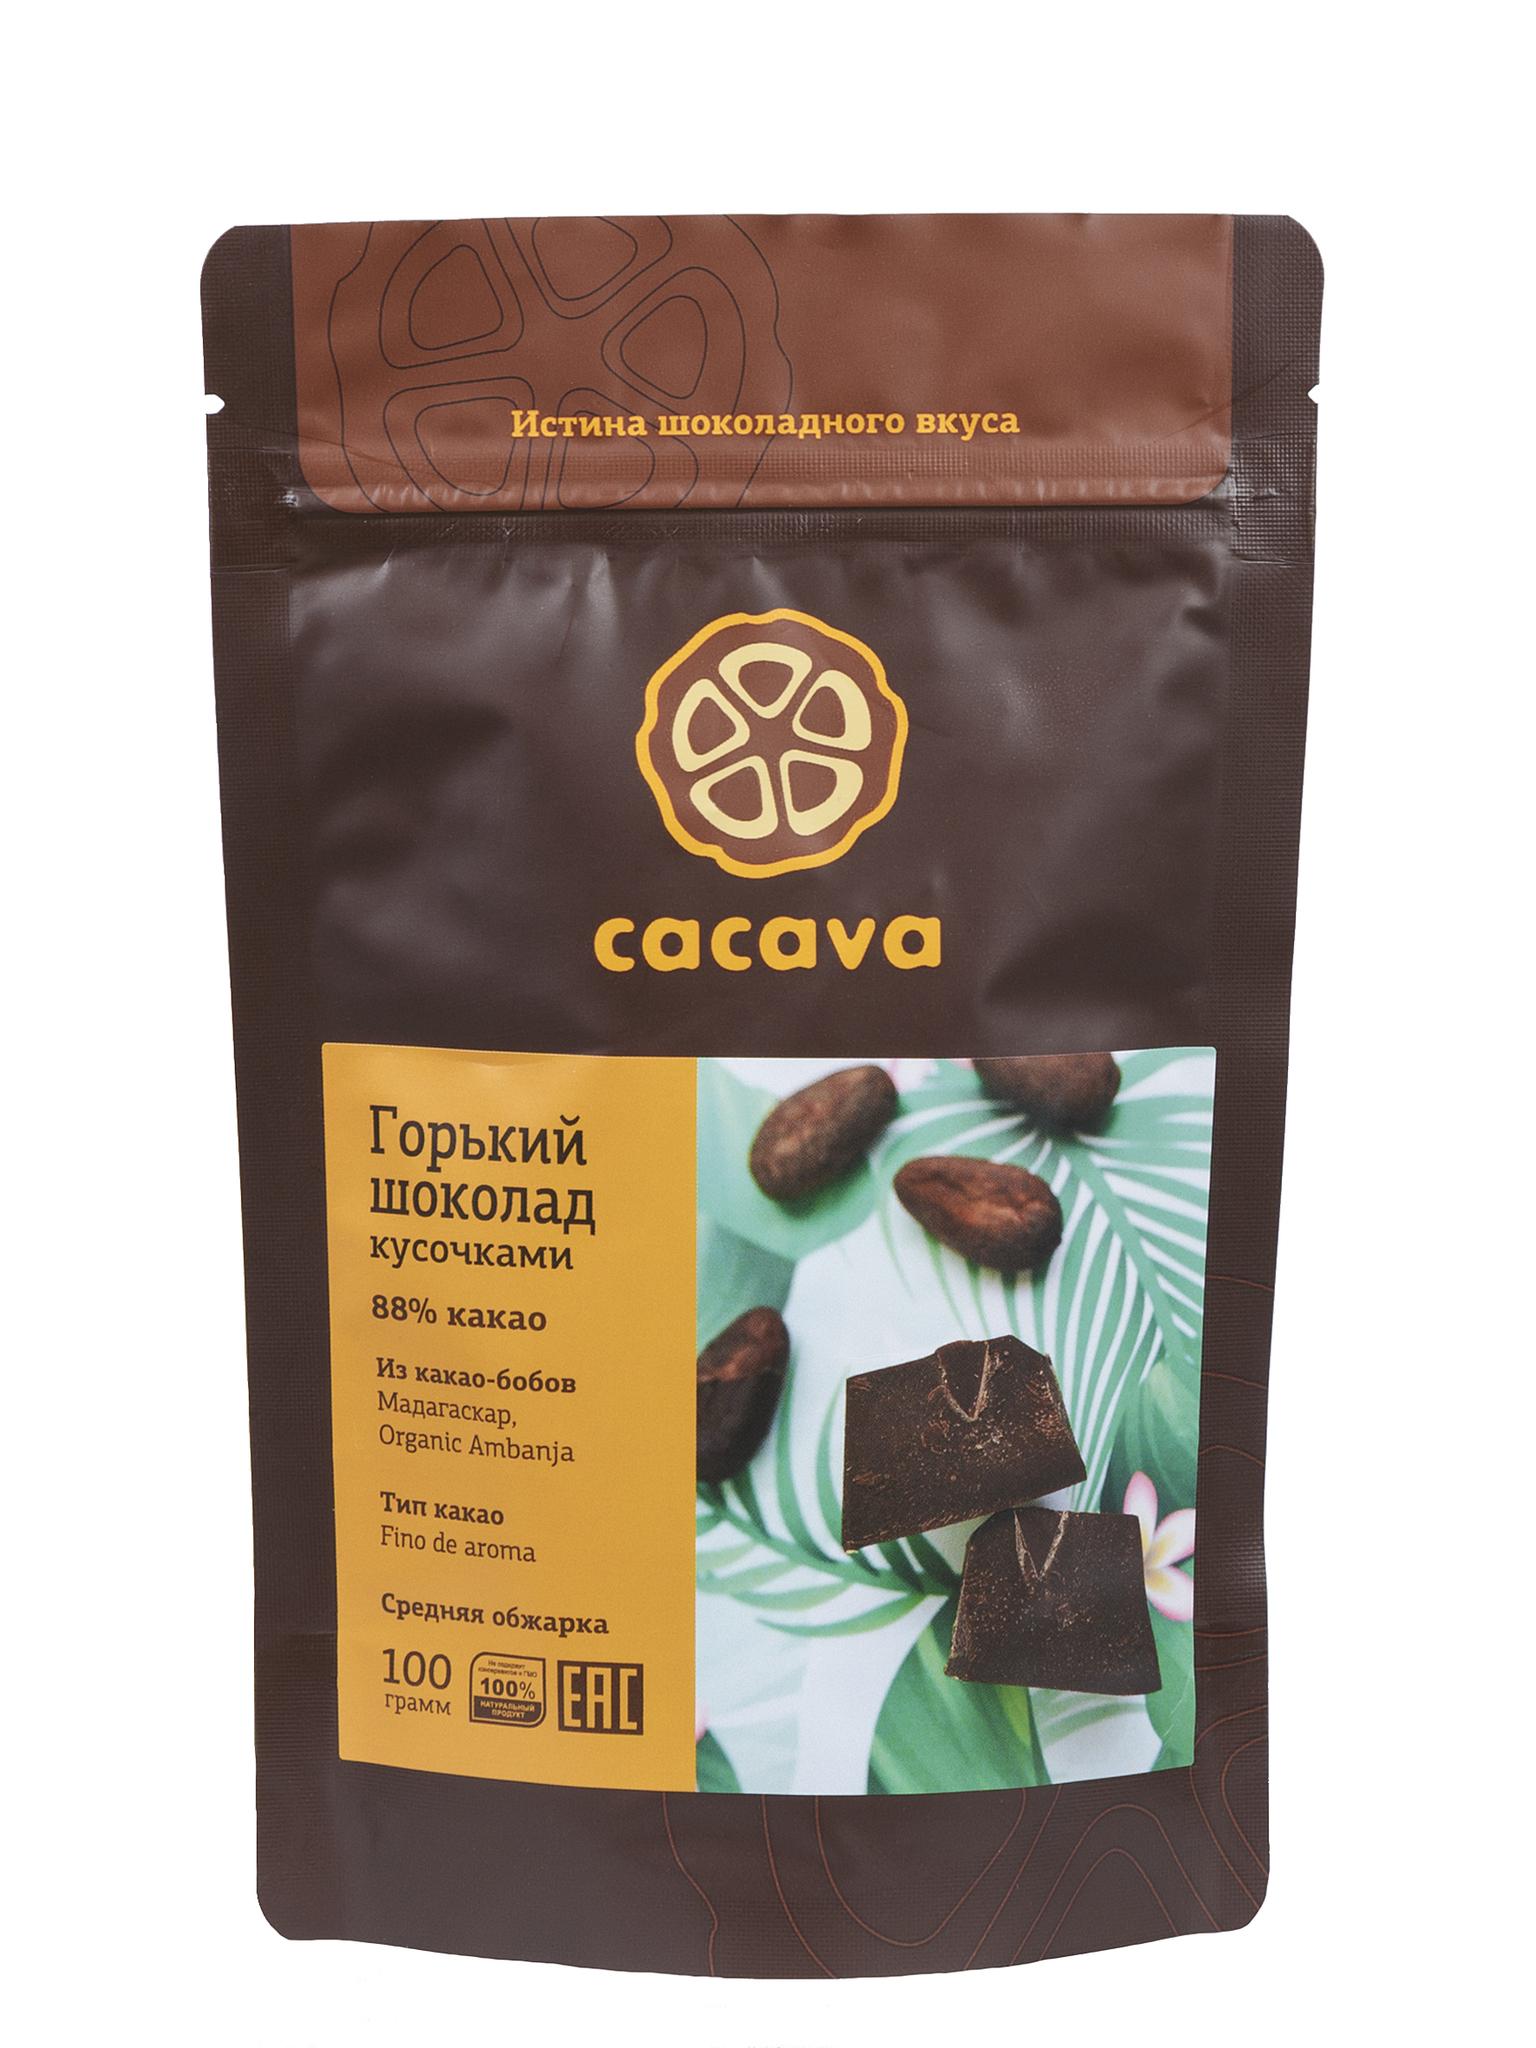 Горький шоколад 88 % какао (Мадагаскар), упаковка 100 грамм